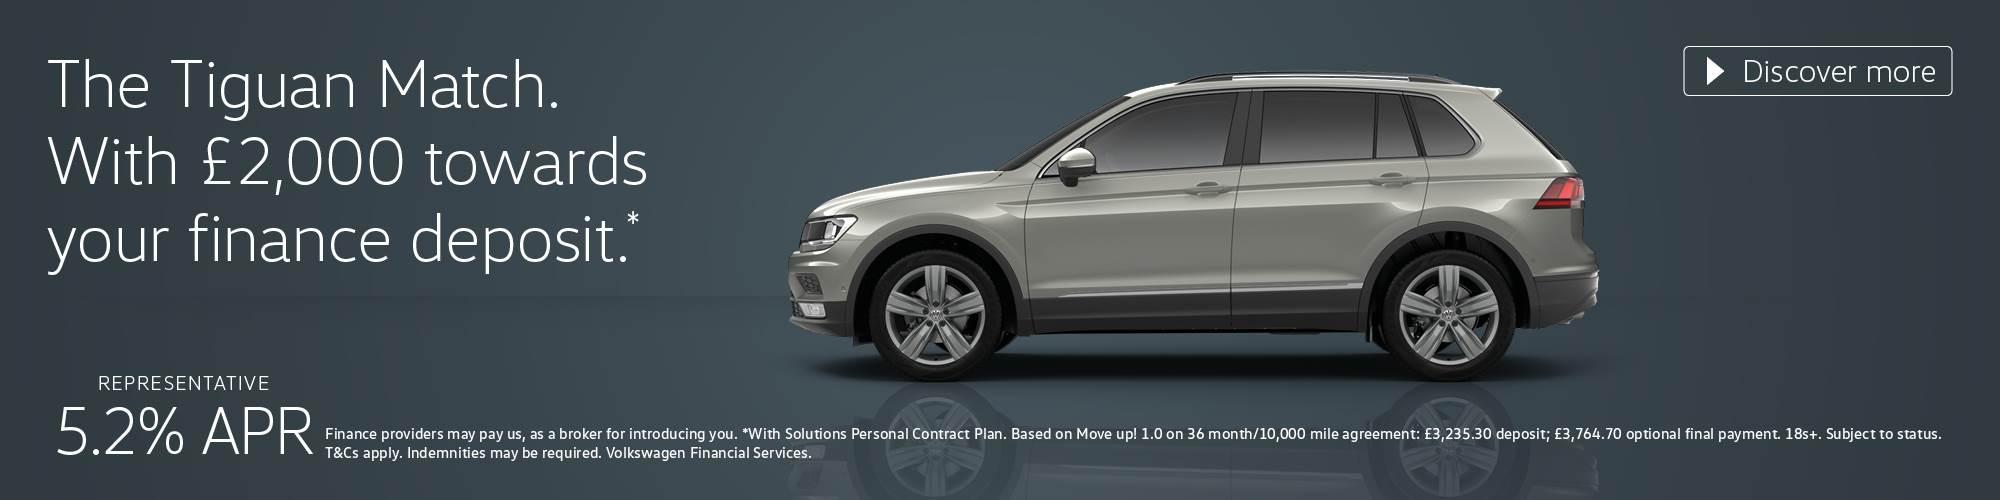 b535b68b12 New Volkswagen Tiguan Match